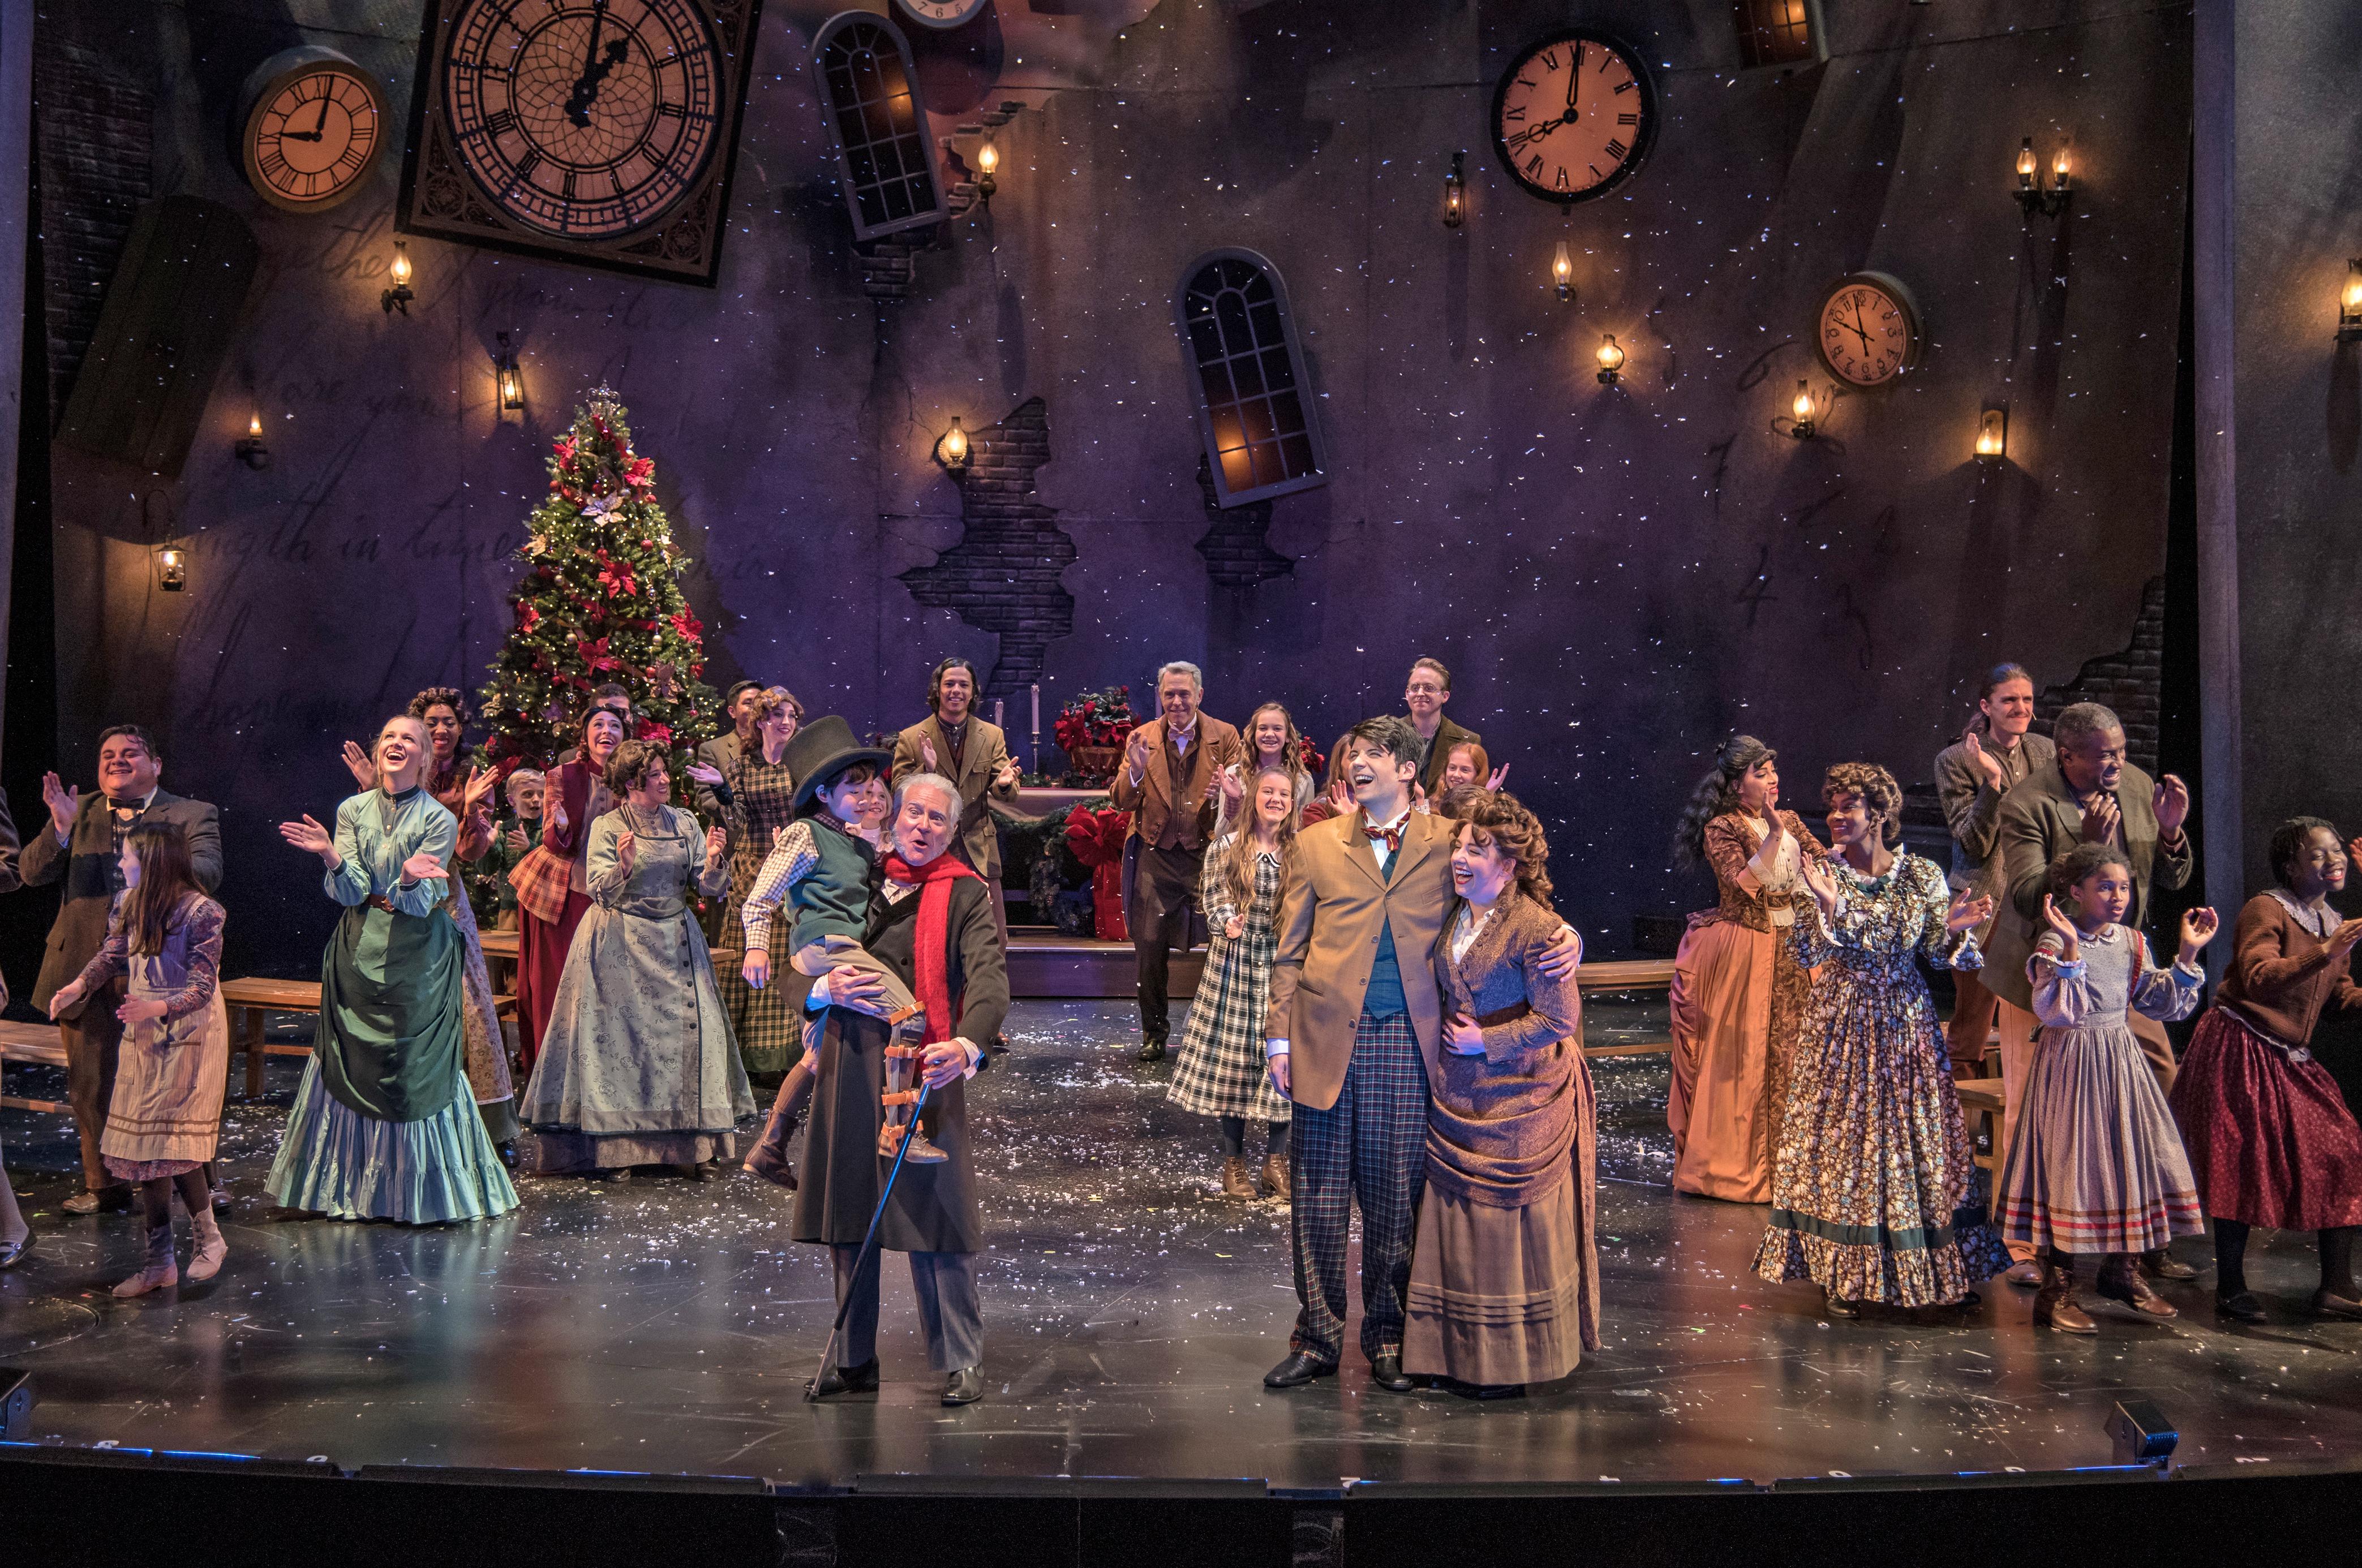 A Christmas Carol Austin Texas 2020 Zach Theater A Christmas Carol | ZACH Theatre | Austin, TX | Family Holiday Show